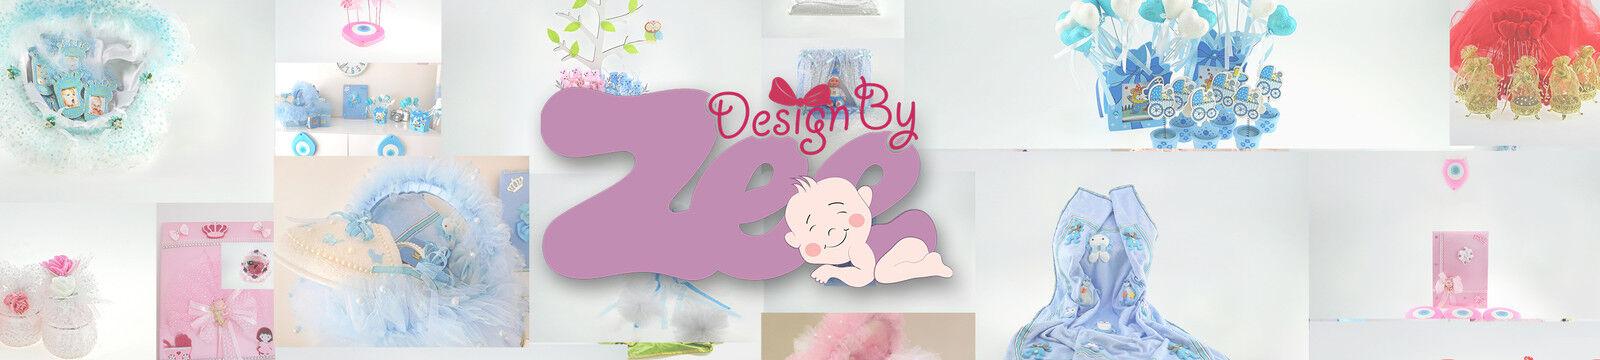 DesignByZee Baby Shower